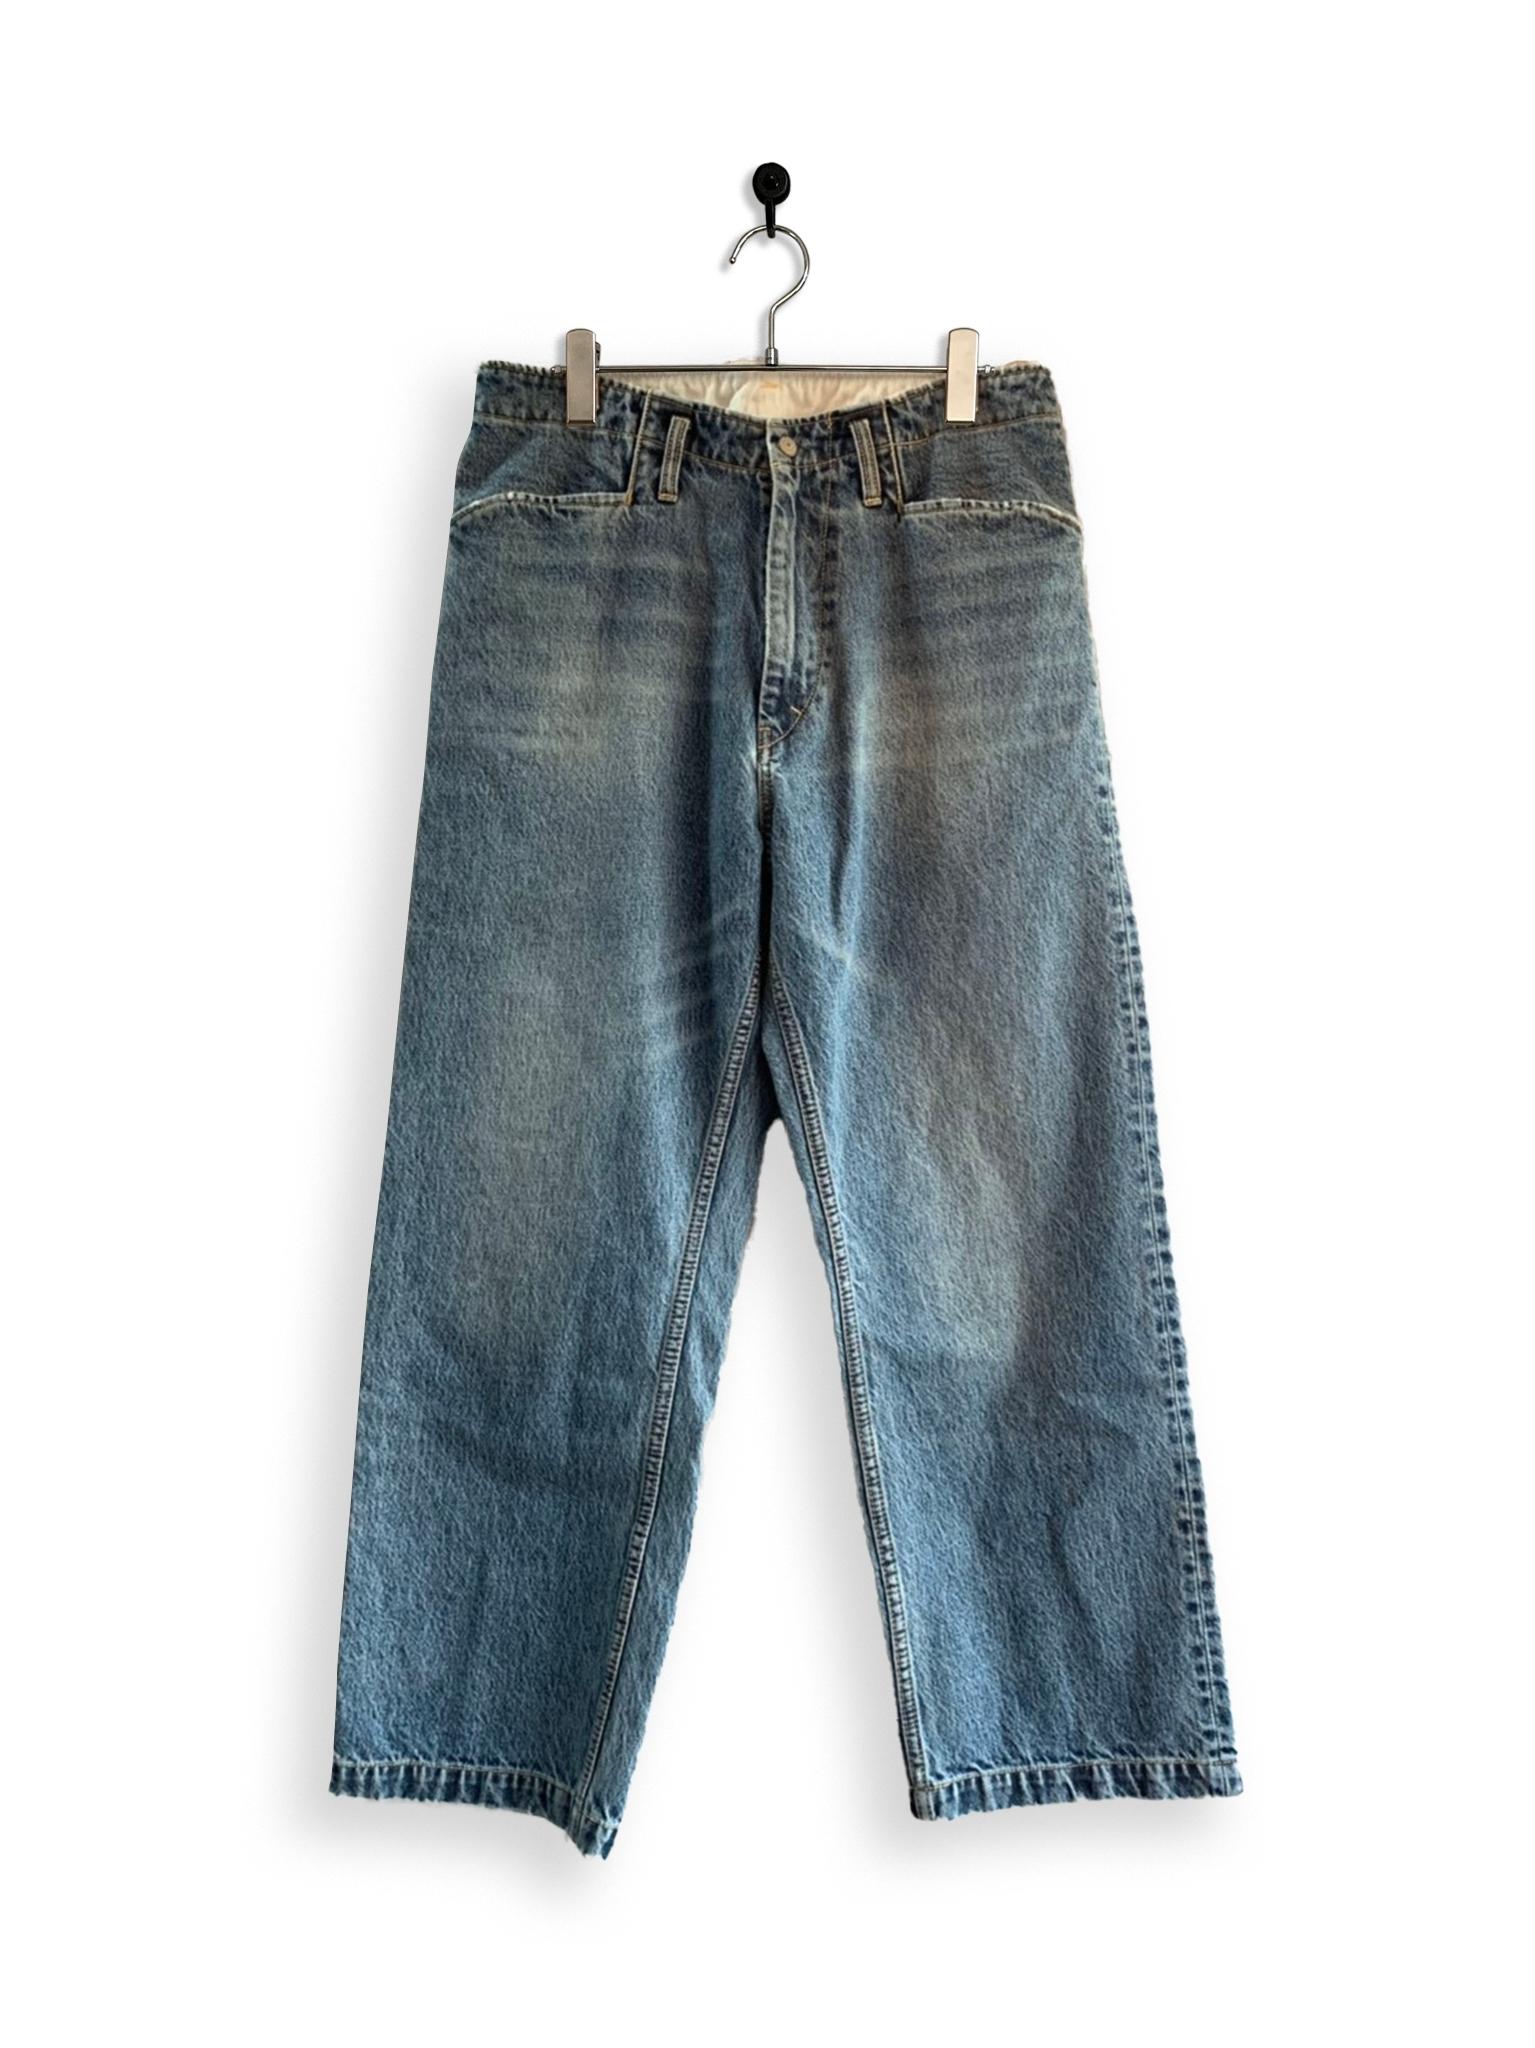 12.5oz Denim Frisco Pants / special wash